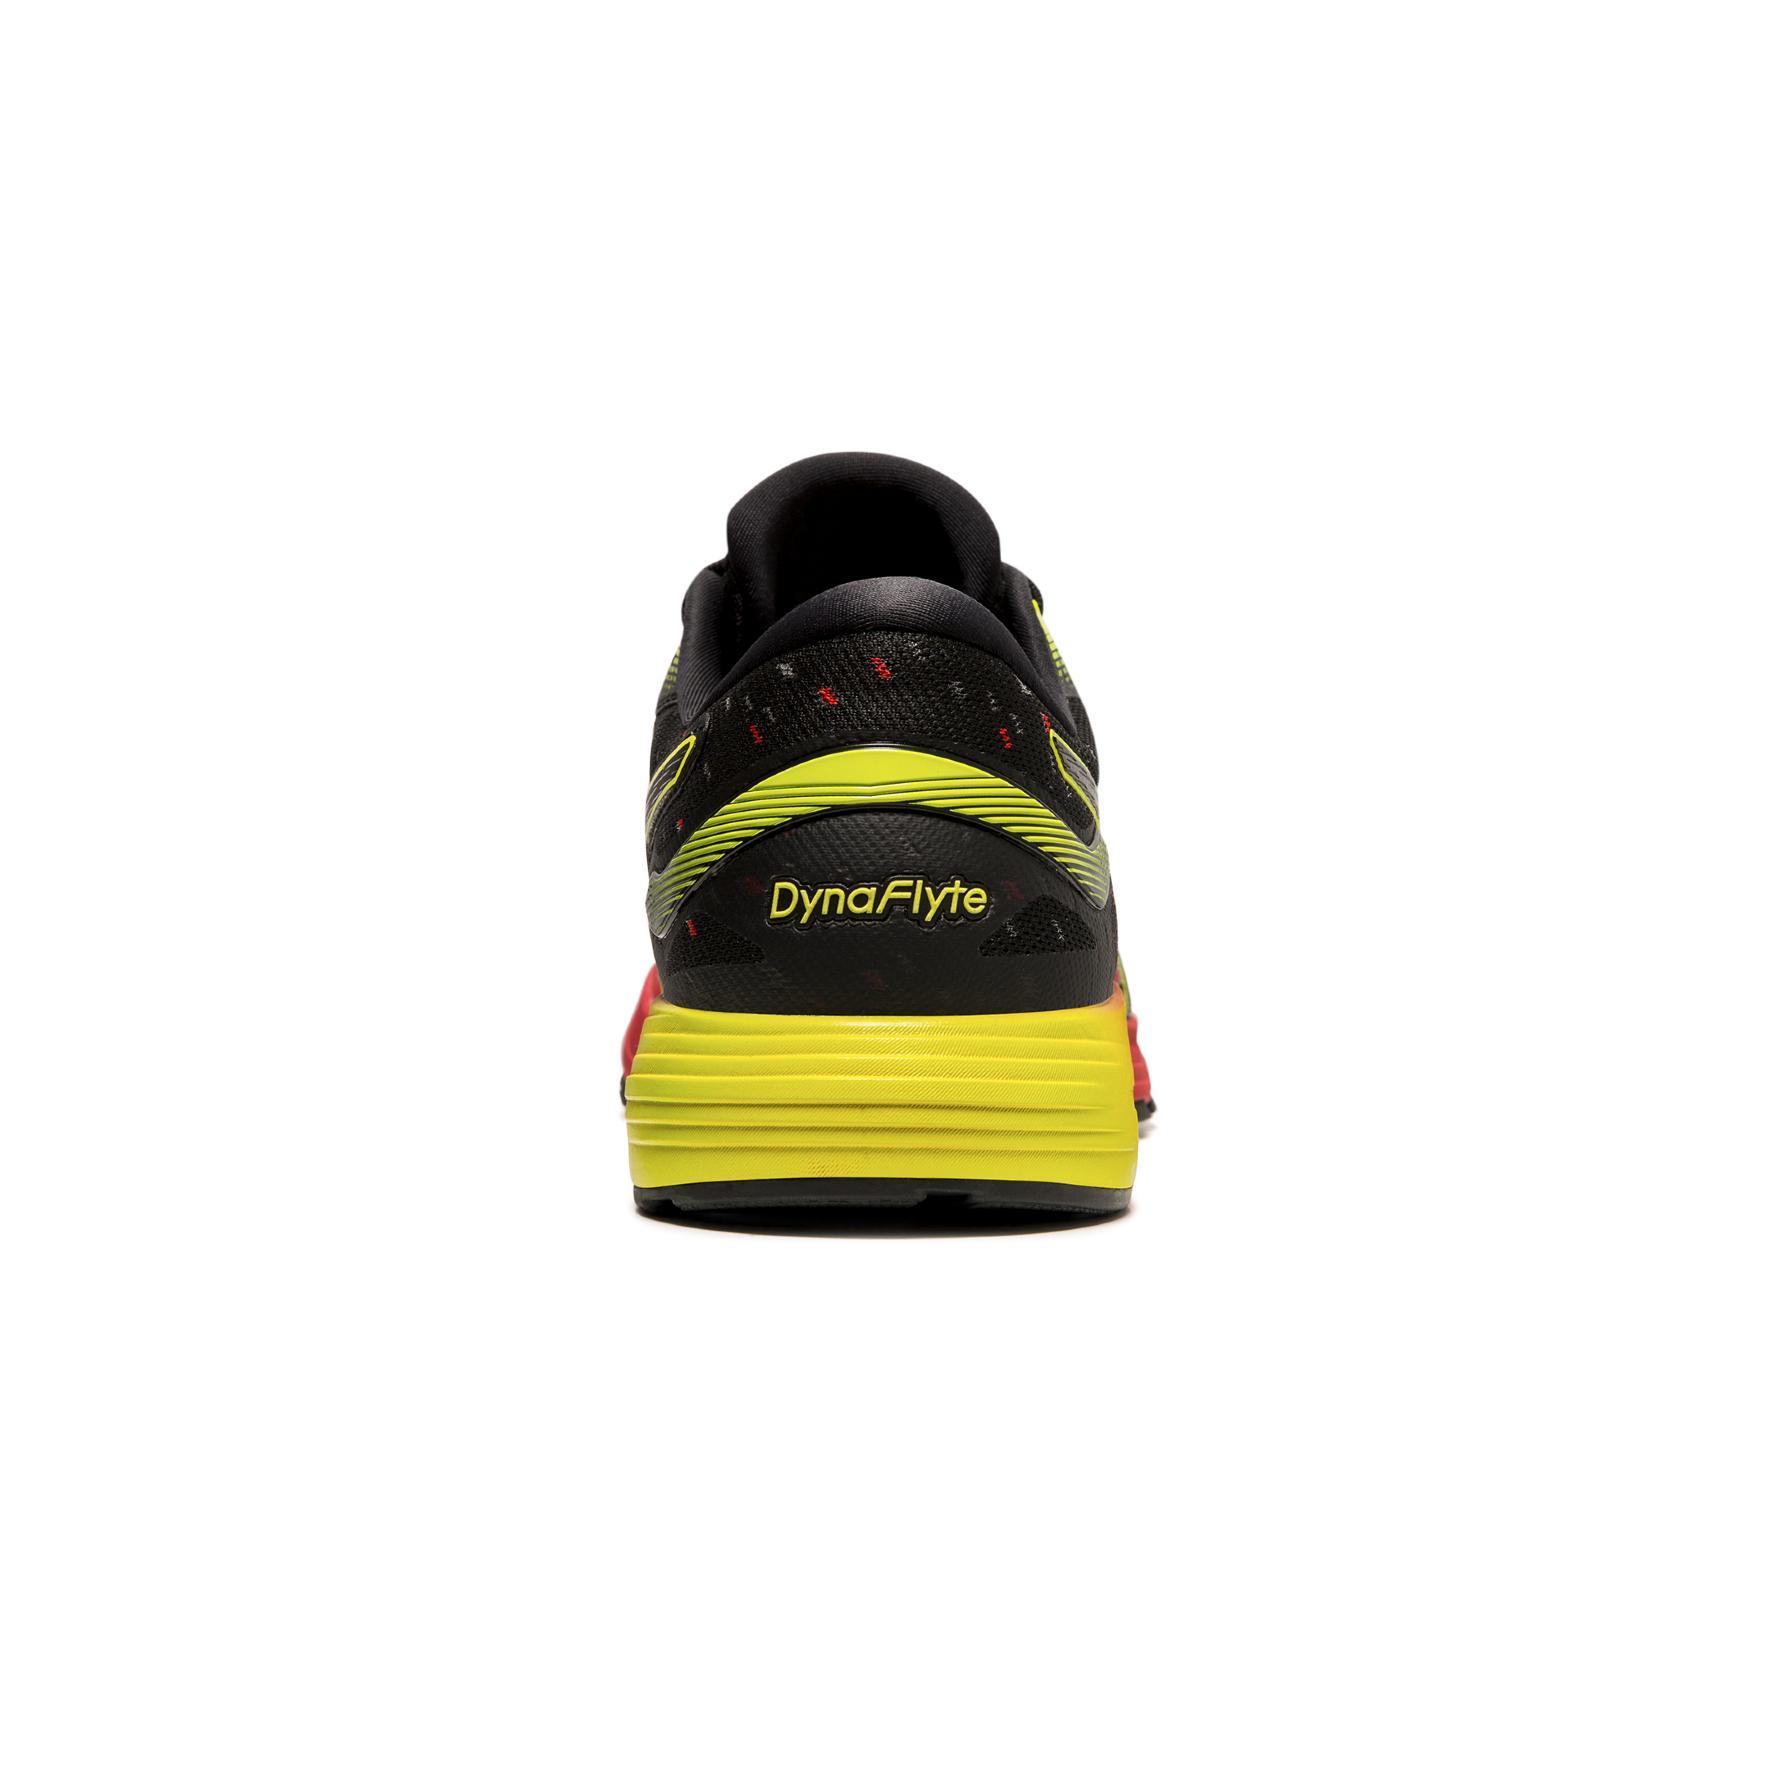 quality design 9fd46 72e85 Asics Shoes DynaFlyte 4